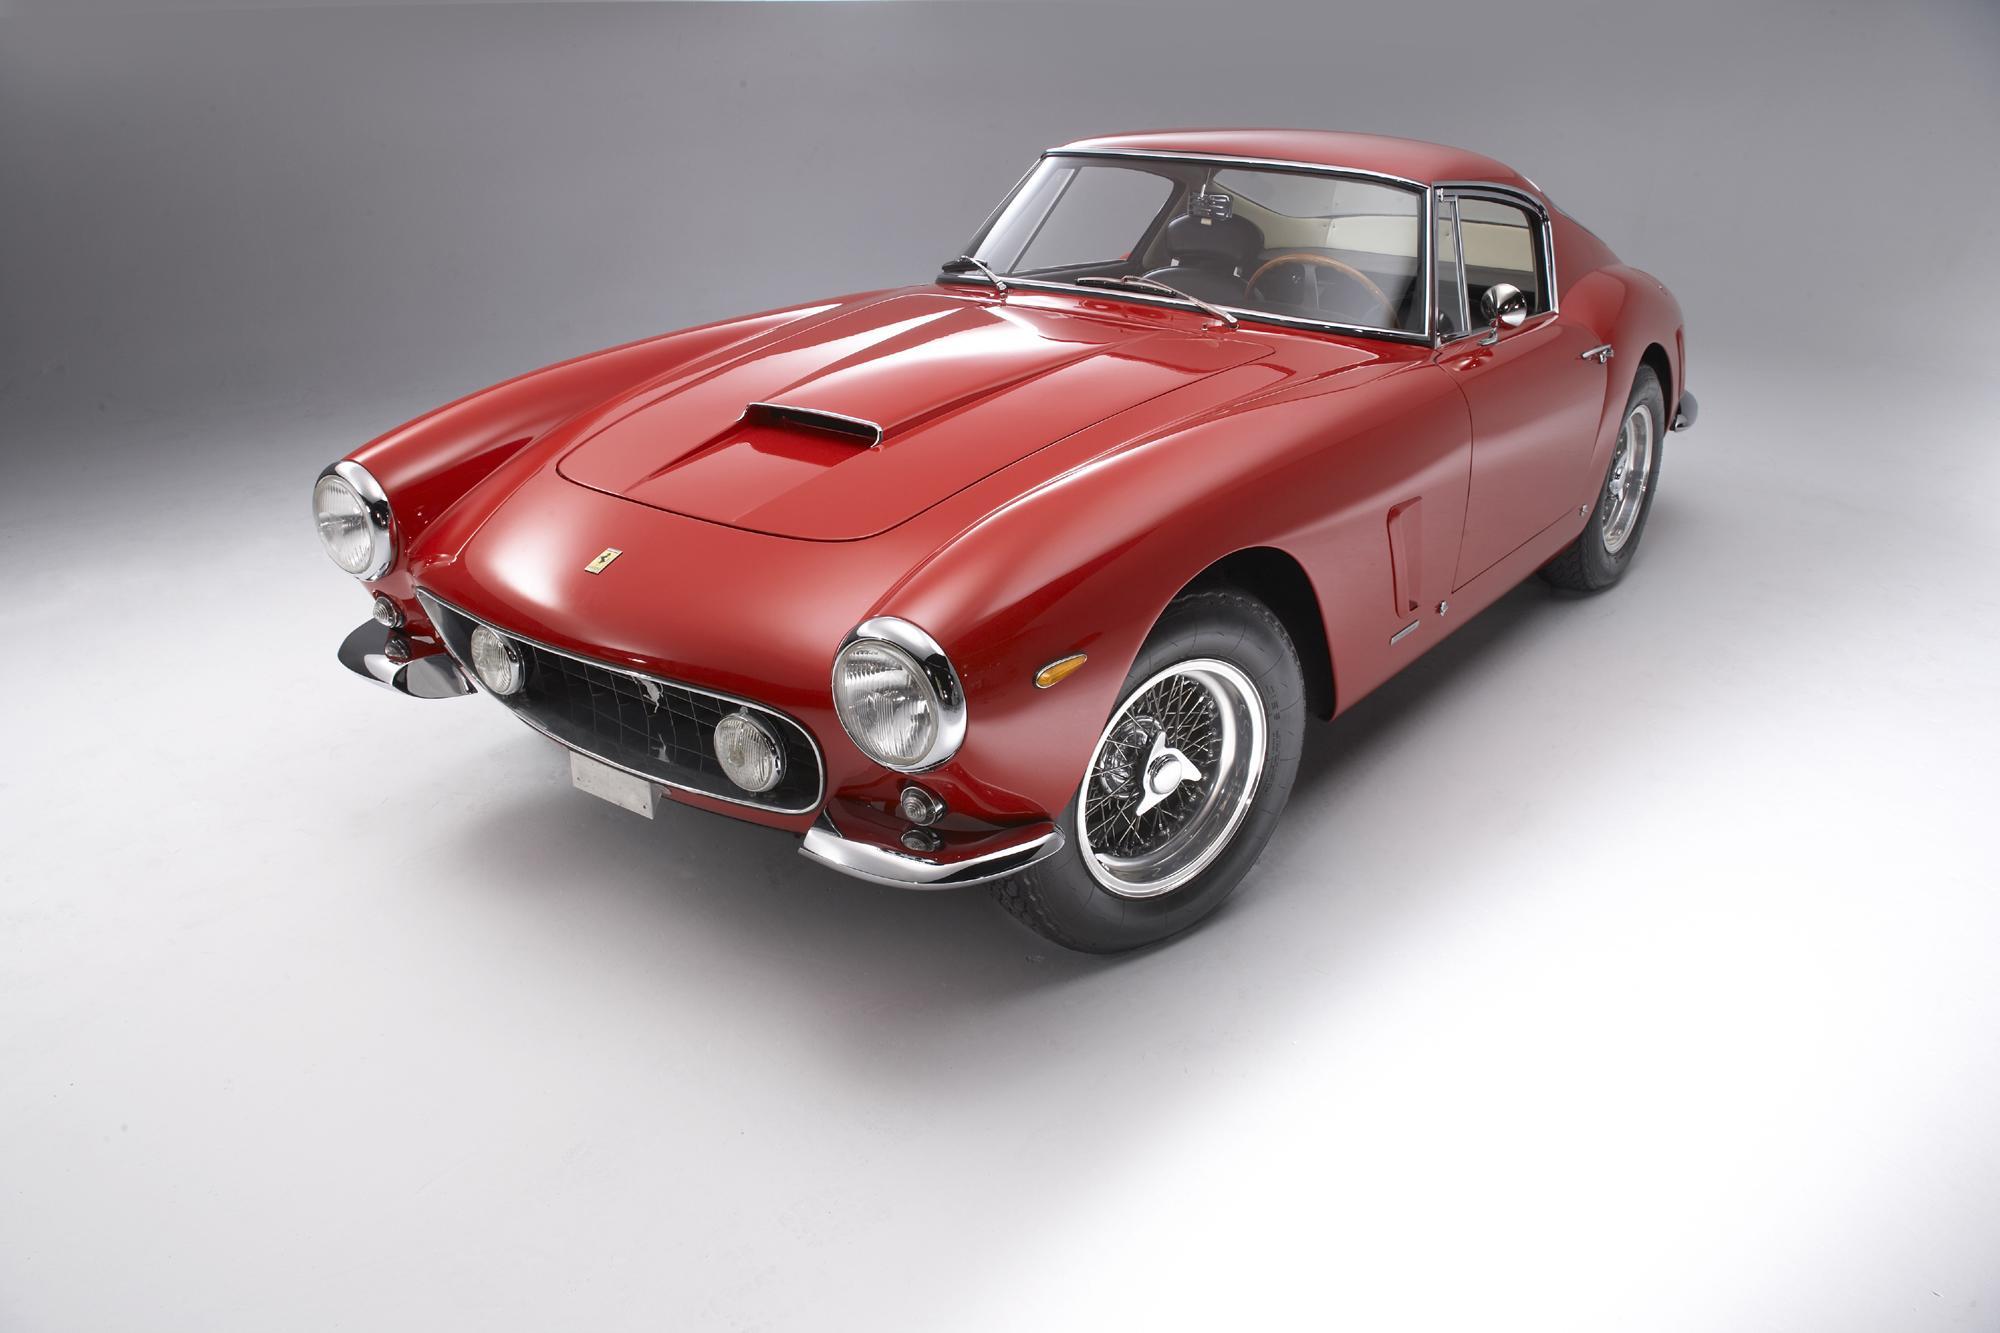 4 5 Million Ferrari Leads Classic Car Auction Scoop News